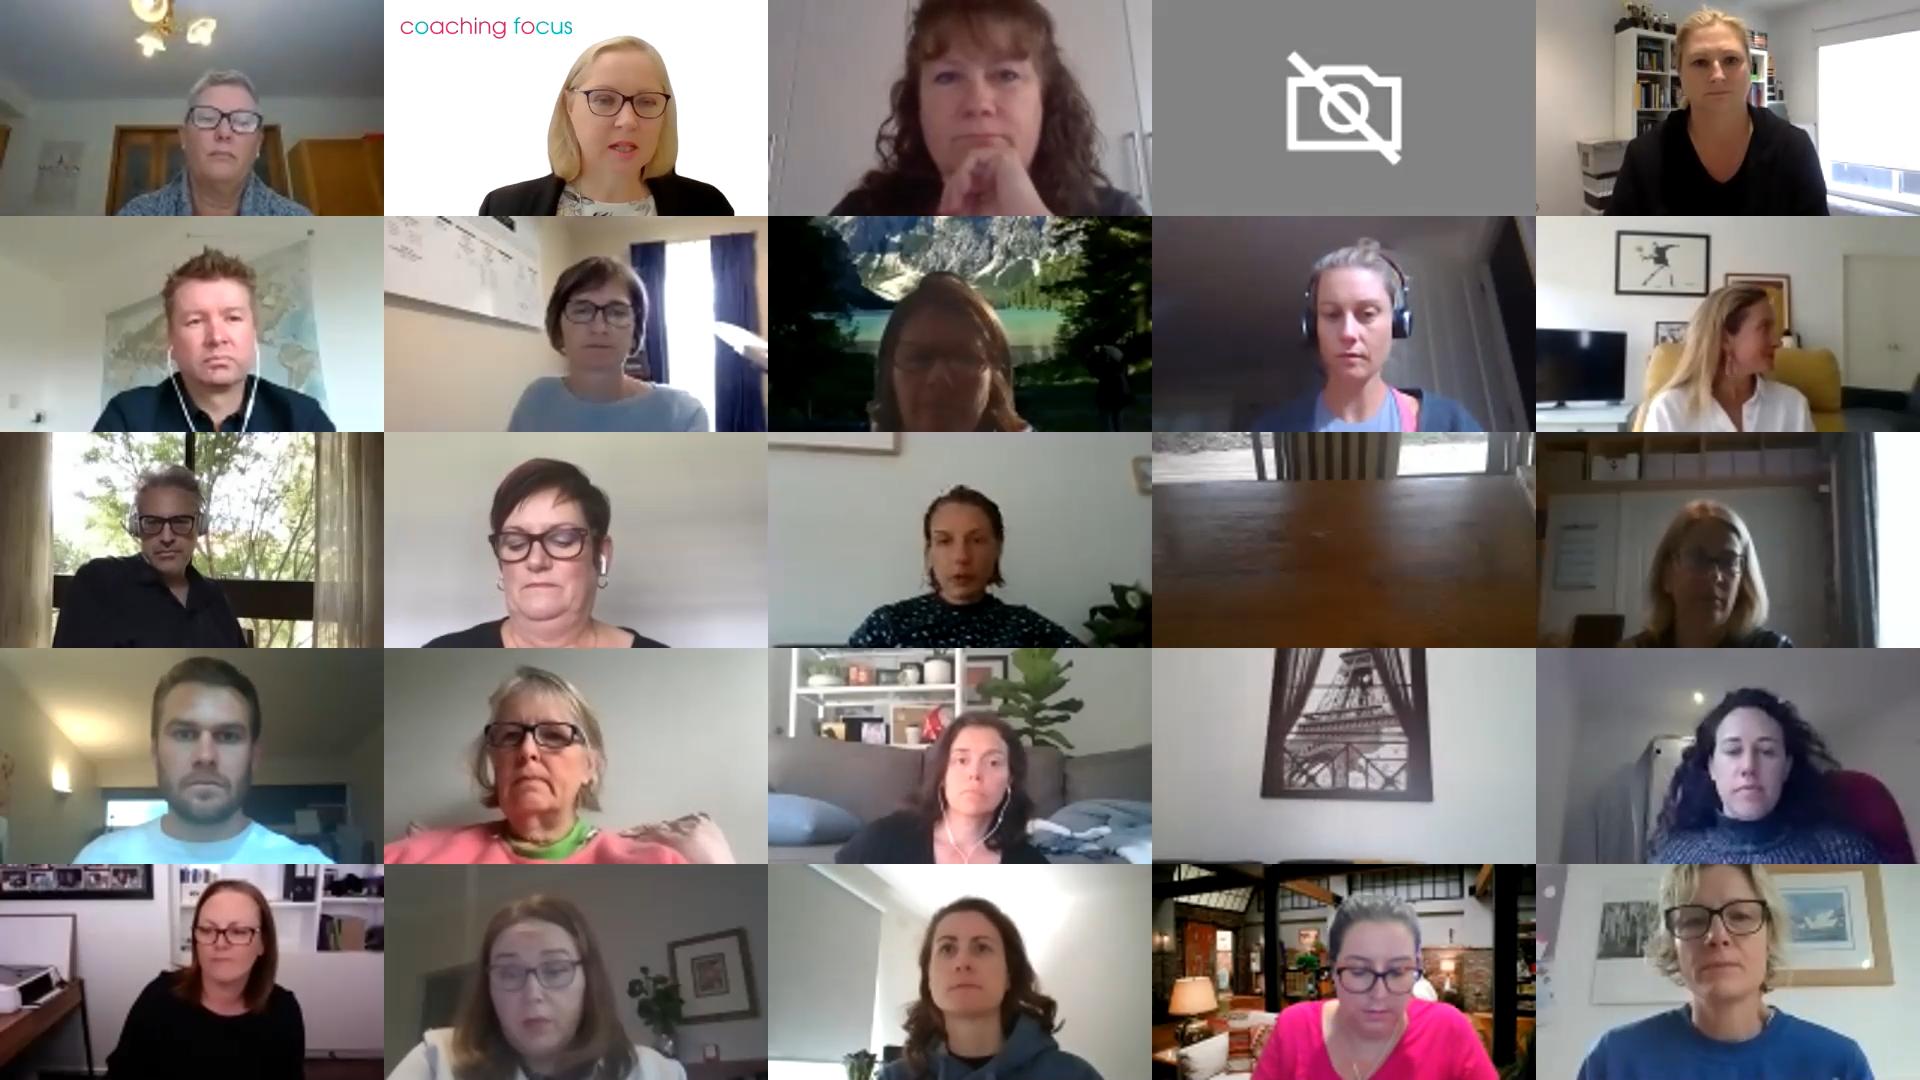 Coaching Focus - Zoom Meeting